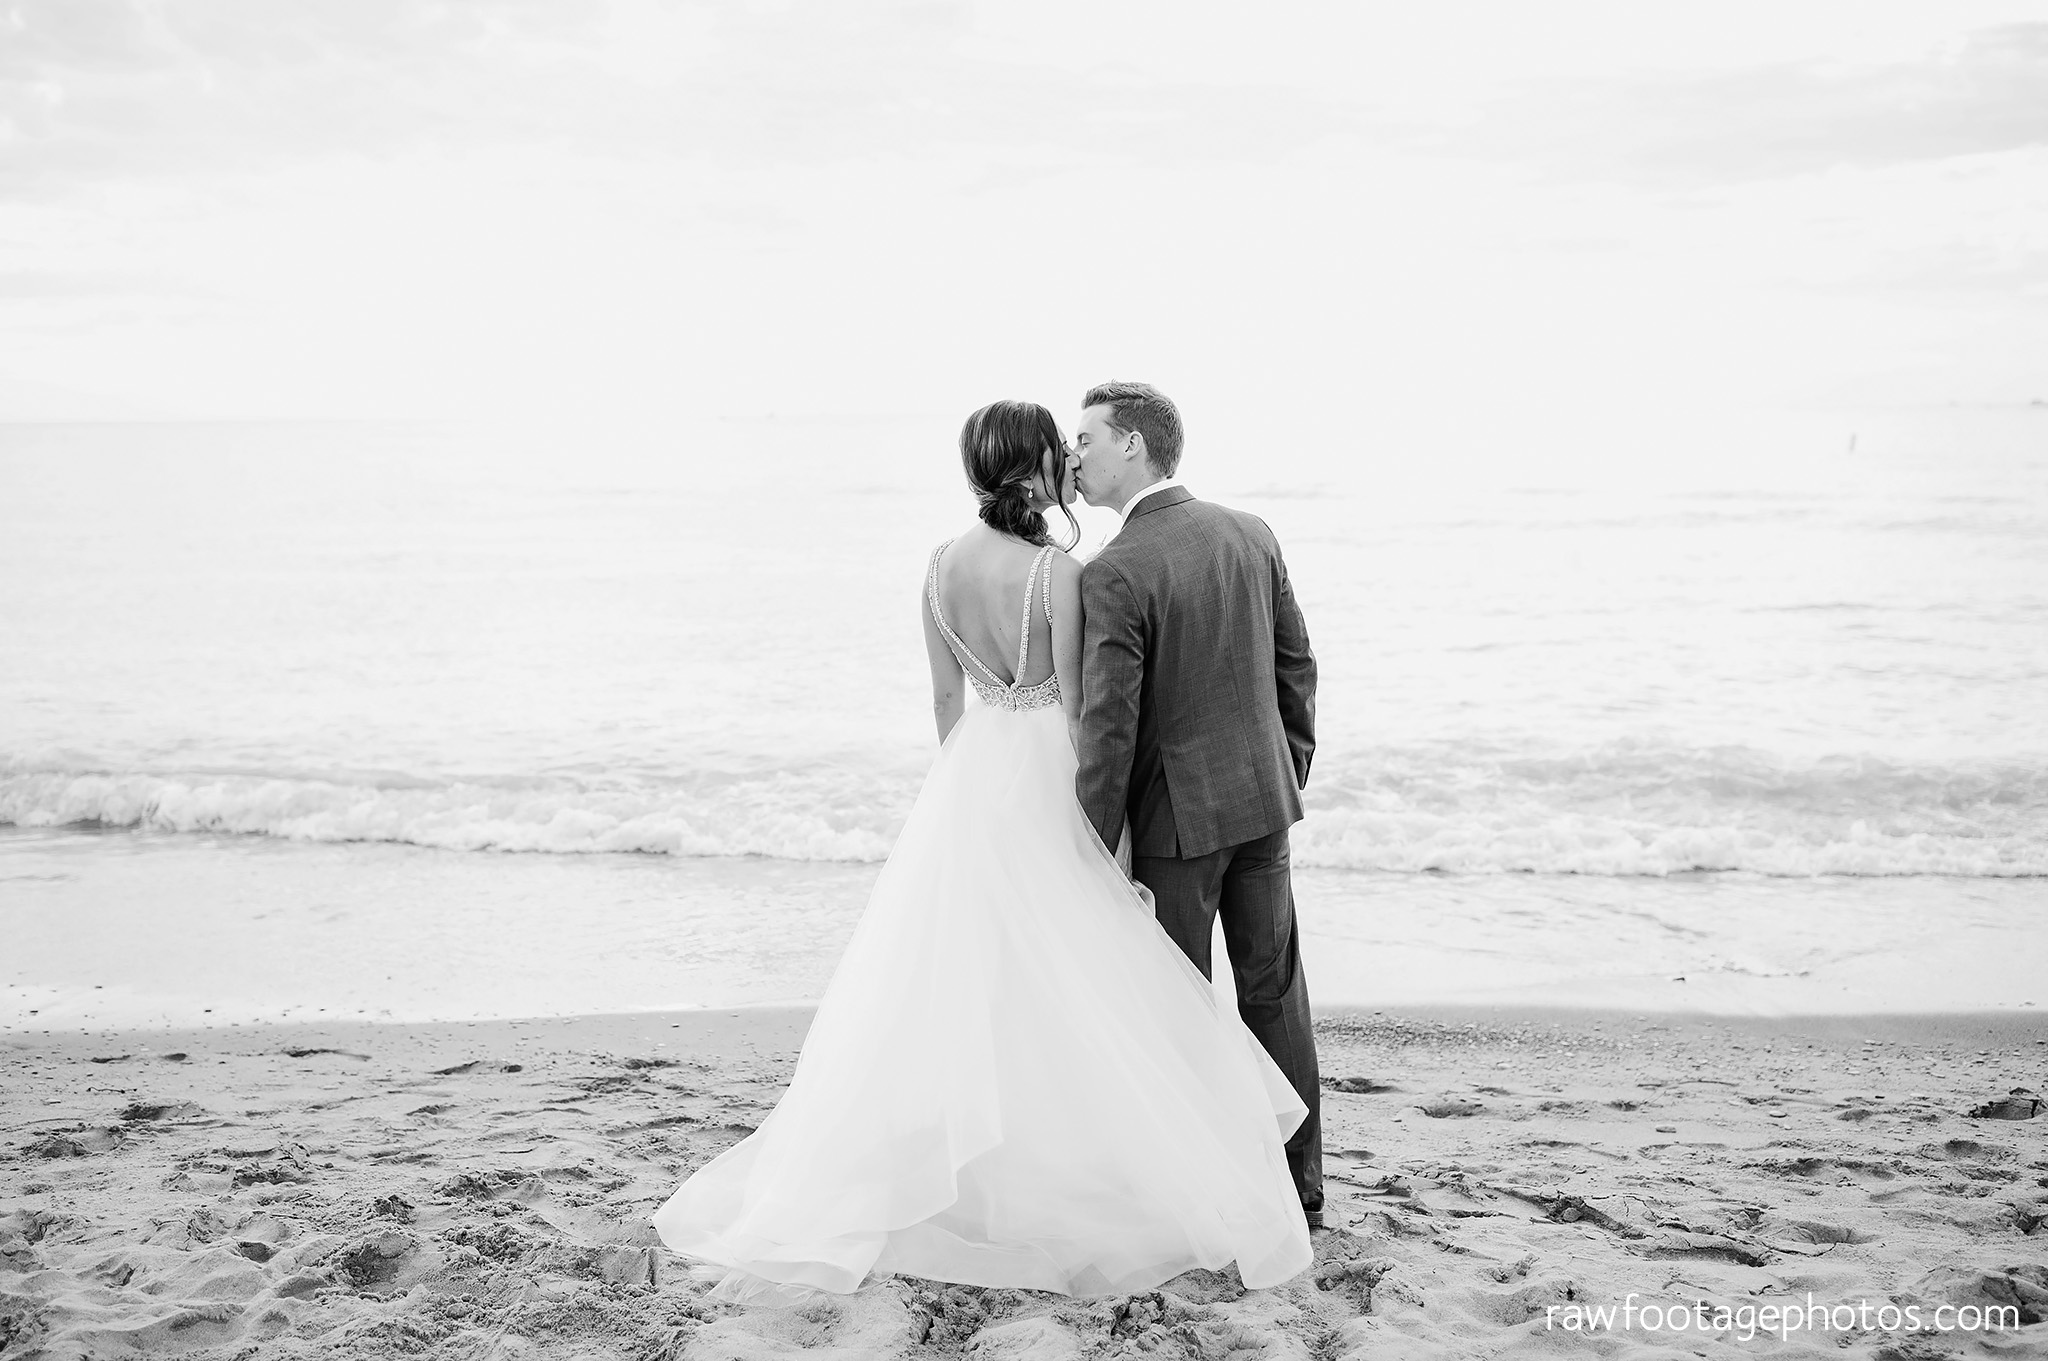 london_ontario_wedding_photographer-grand_bend_wedding_photographer-oakwood_resort_wedding-beach_wedding-sunset_wedding-raw_footage_photography064.jpg